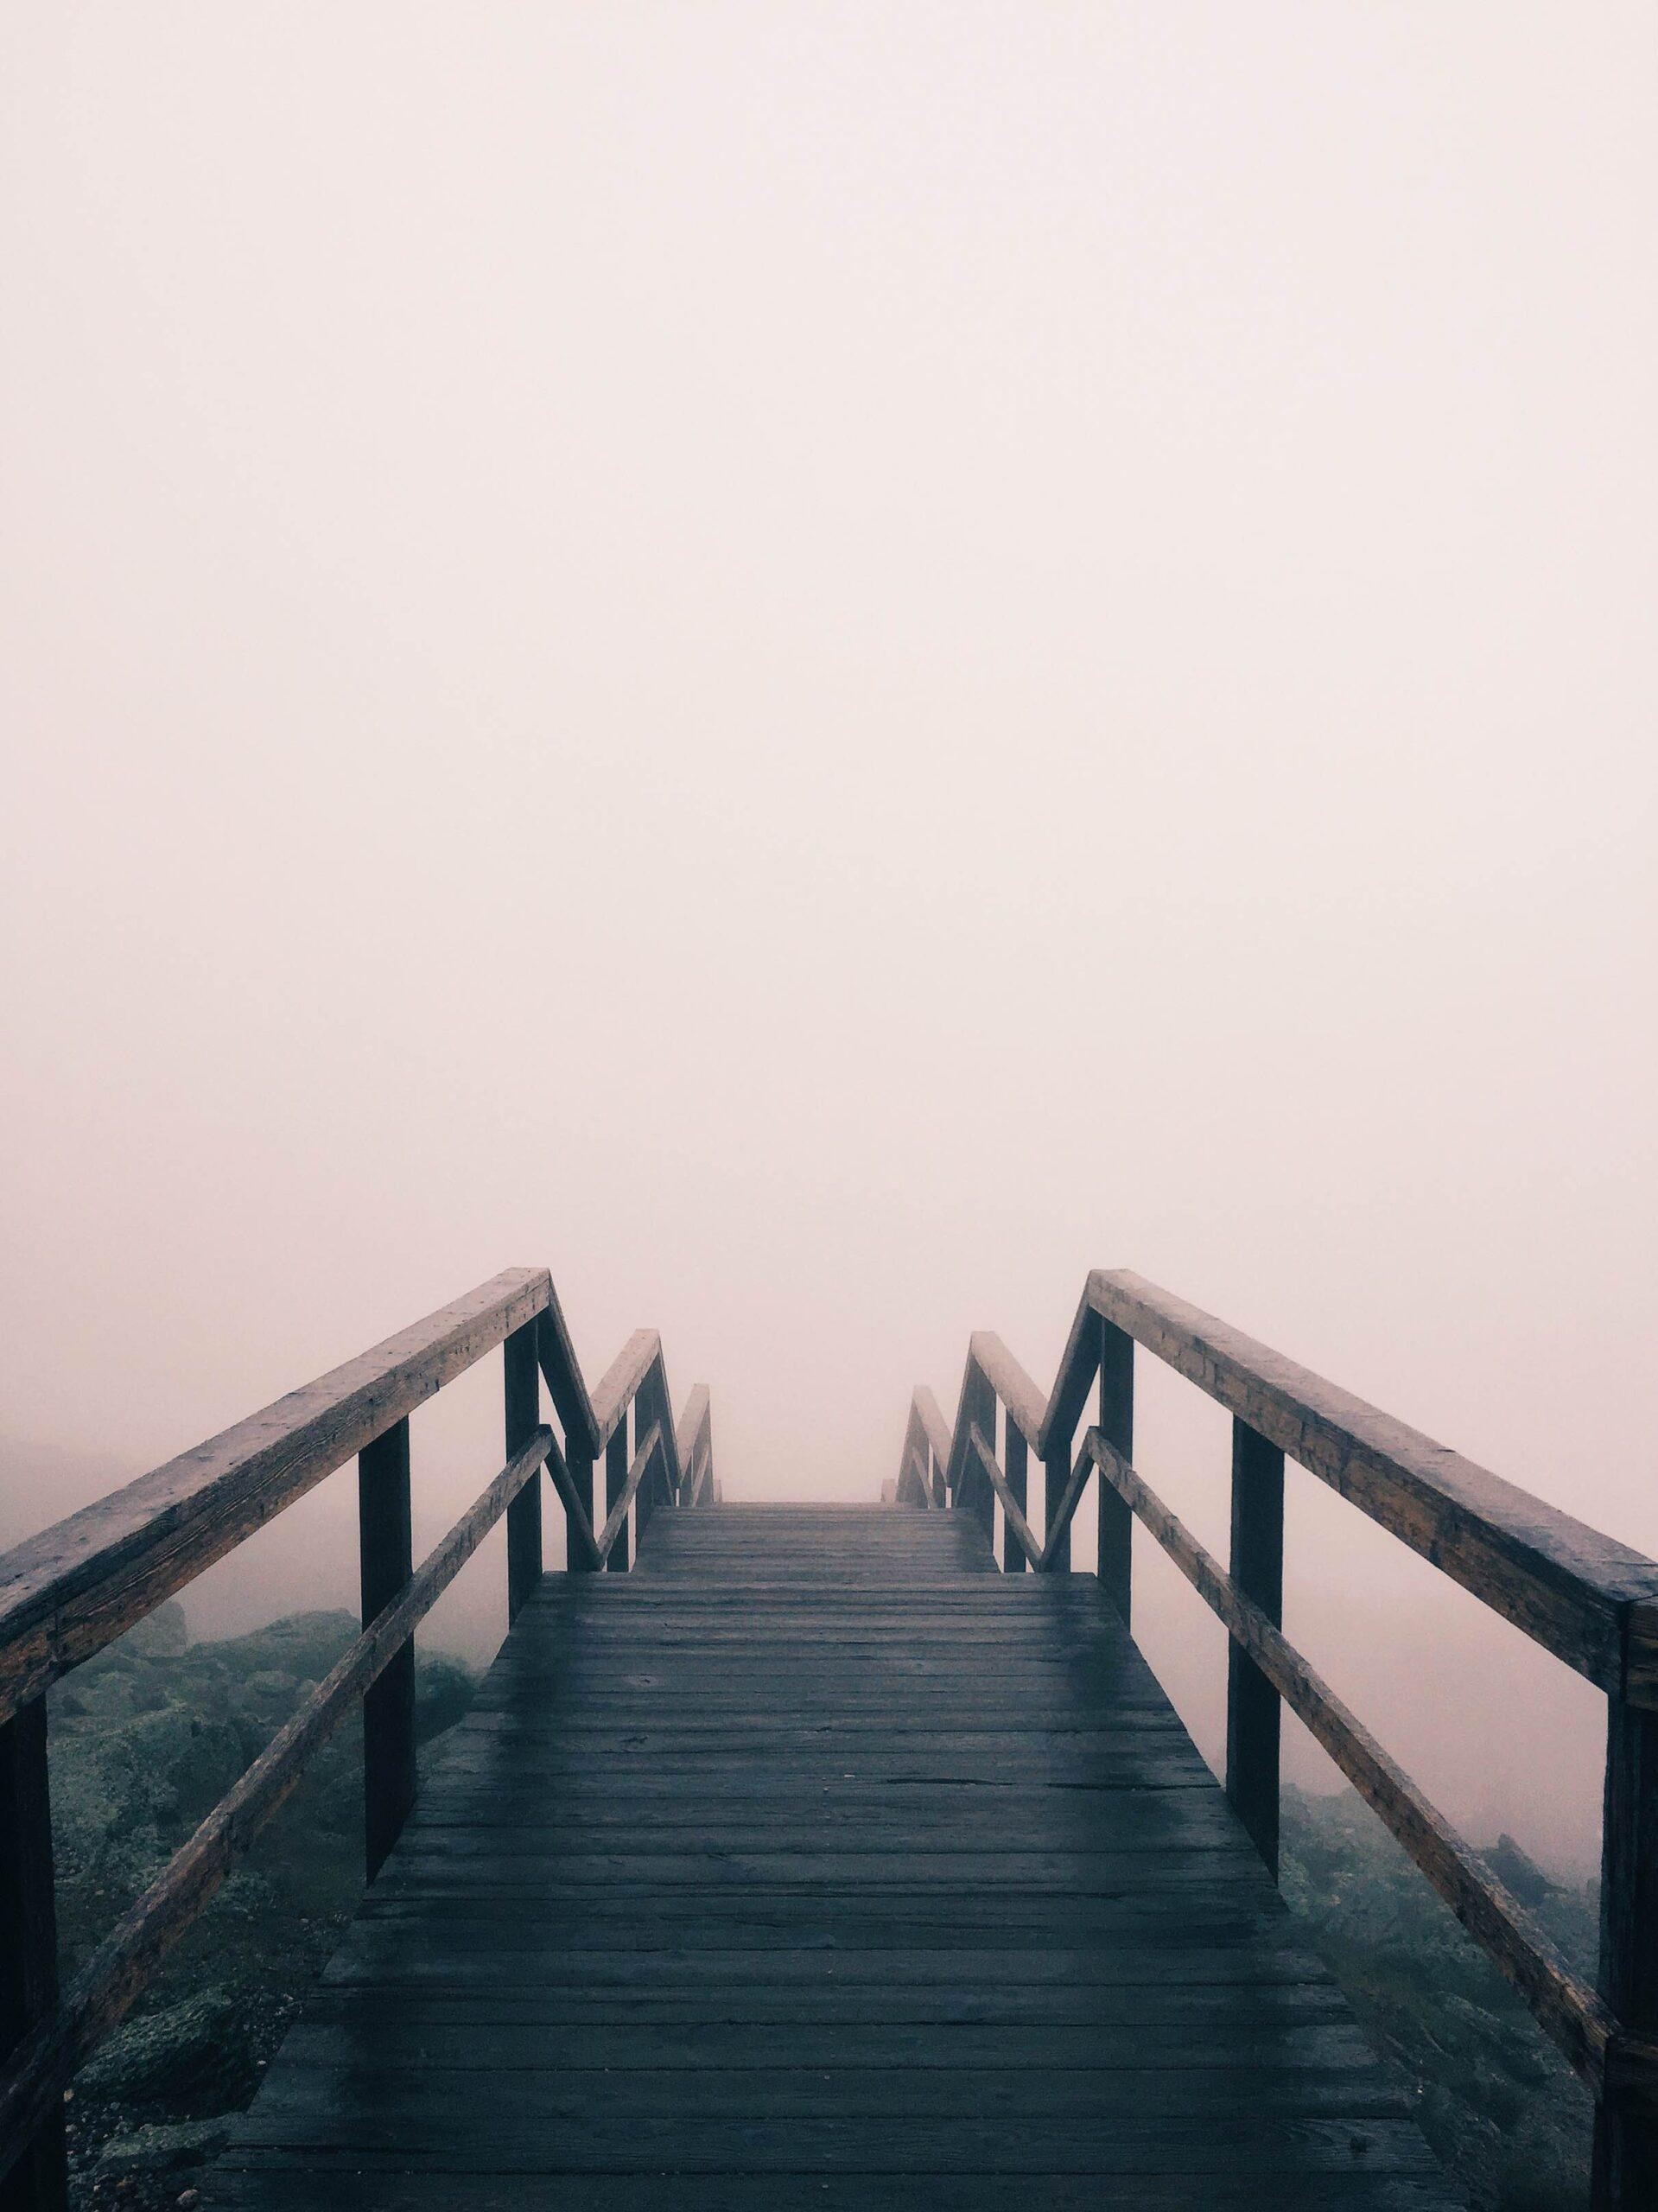 Board walk rising out of fog